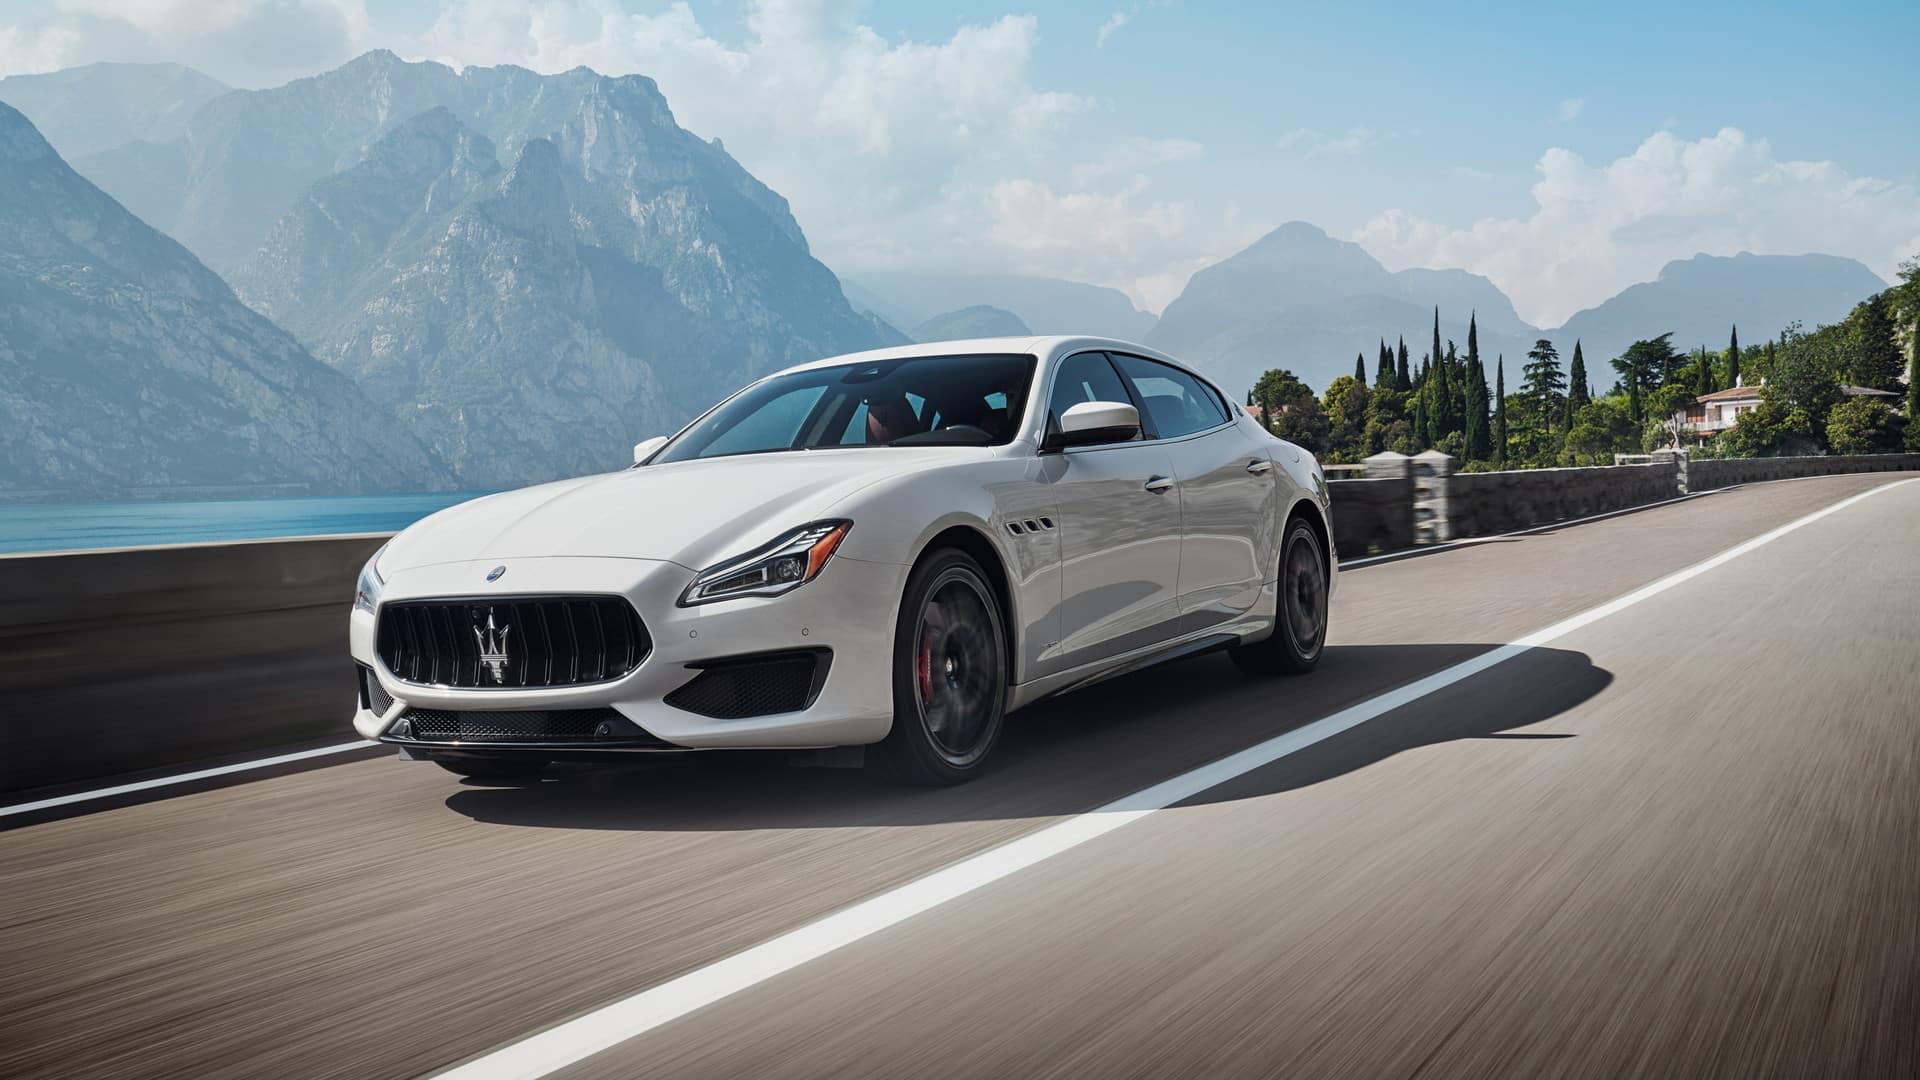 Maserati Quattroporte performance